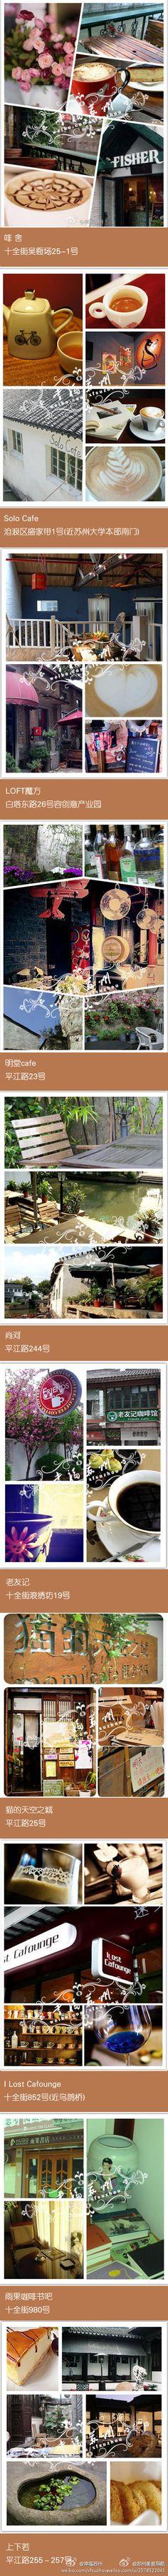 91 Best Suzhou Jiangsu Images On Pinterest China Travel 8d Muslim Beijing Hangzhou Shanghai